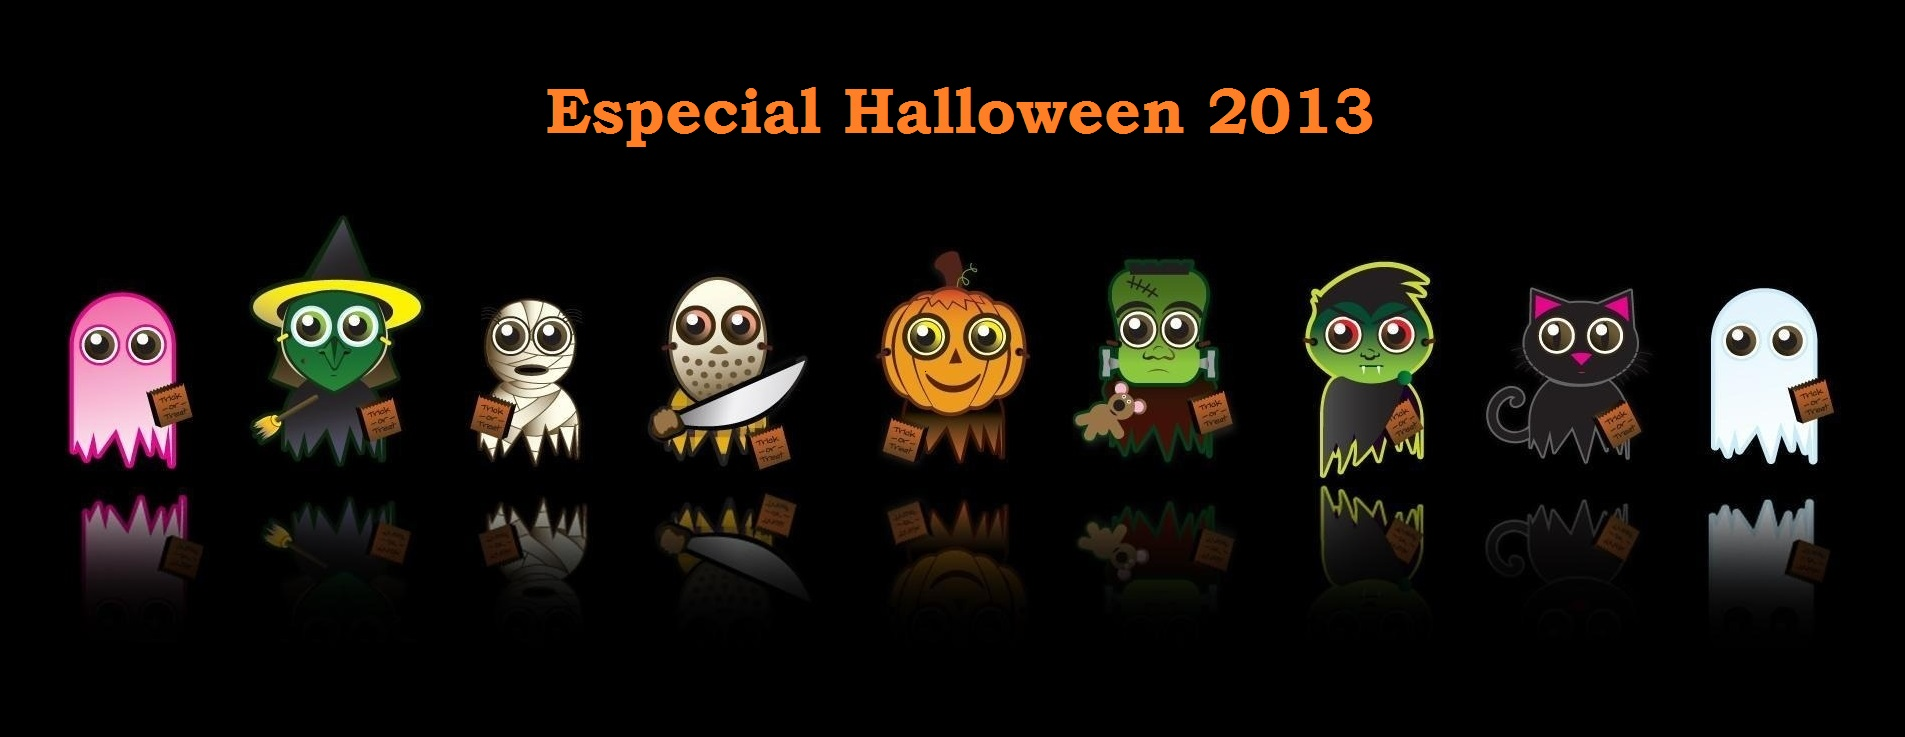 Especial Halloween 2013